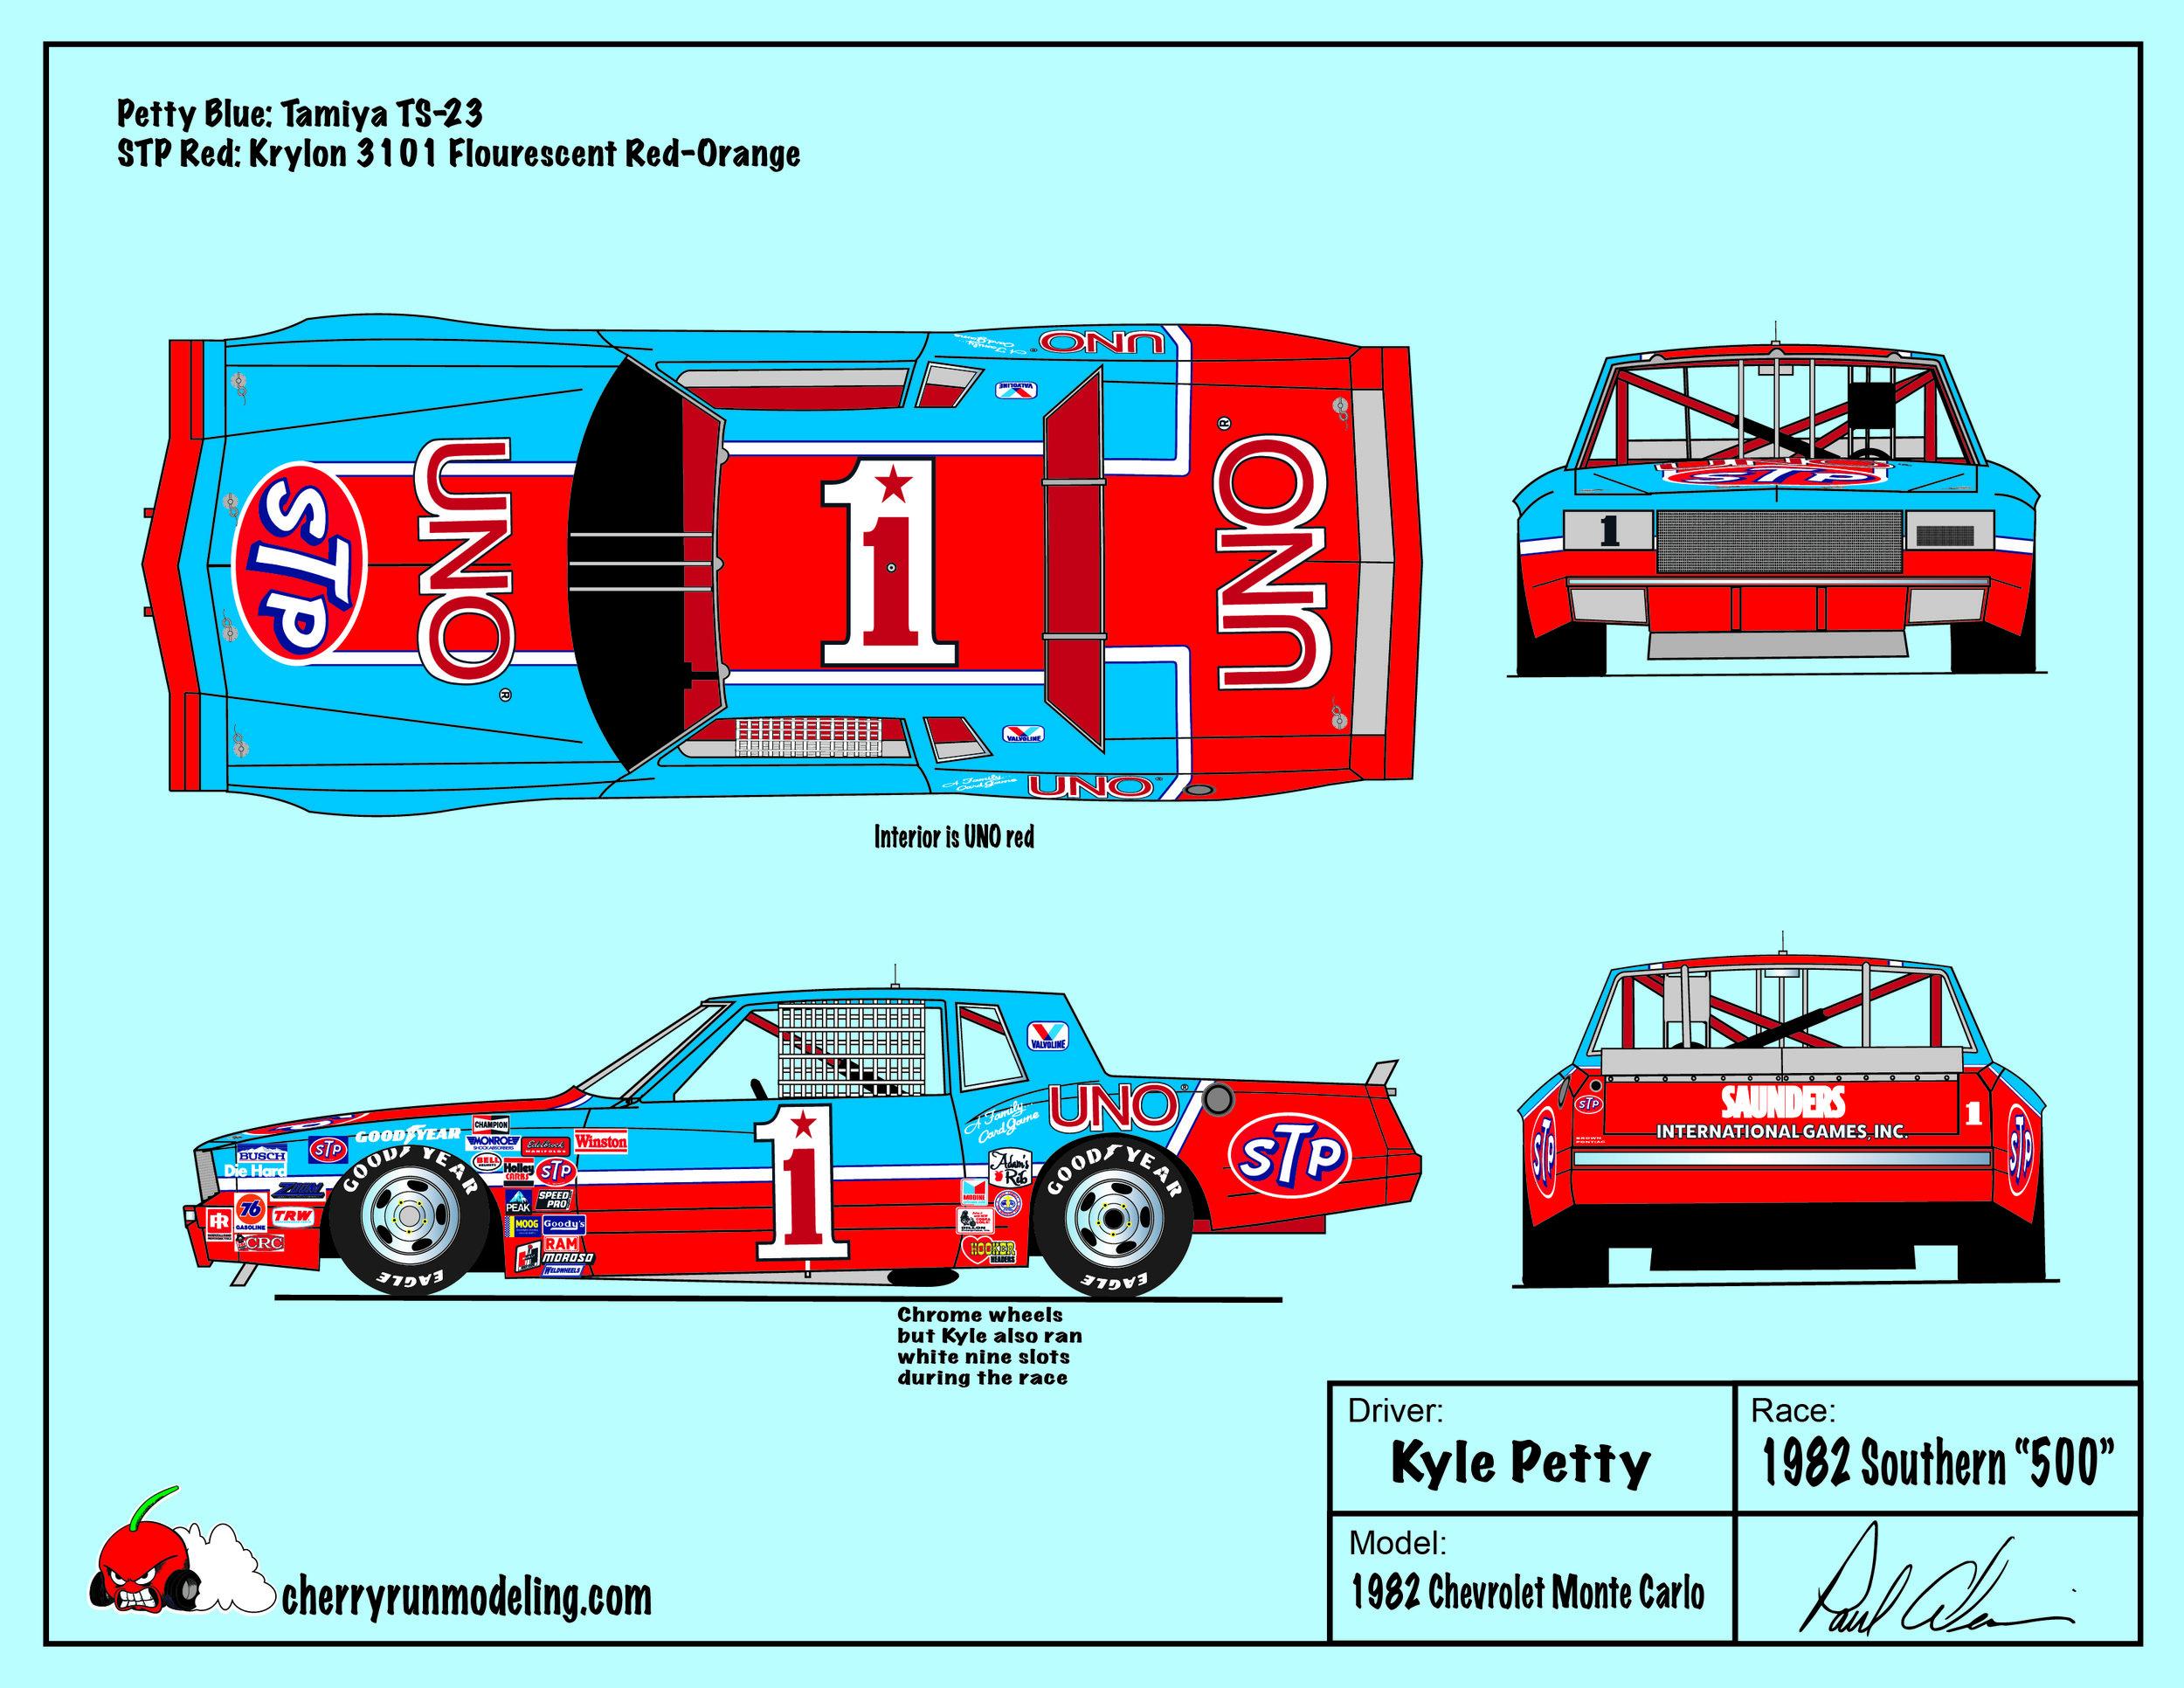 Kyle Petty 1982 Southern 500.jpg